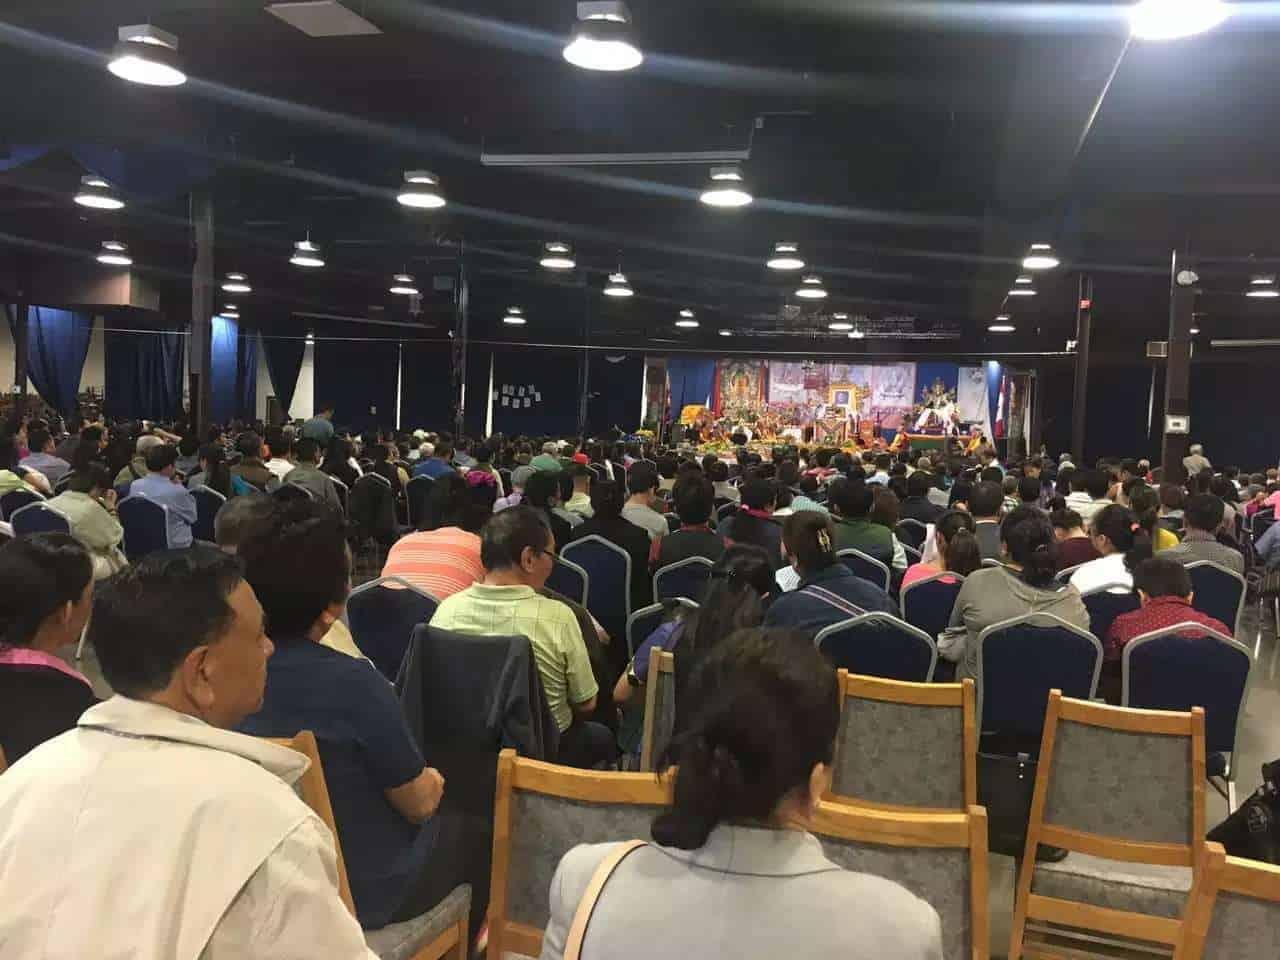 gosok-rinpoche-toronto-2016-65a7306f92a71ed7b17ab34714c06aa